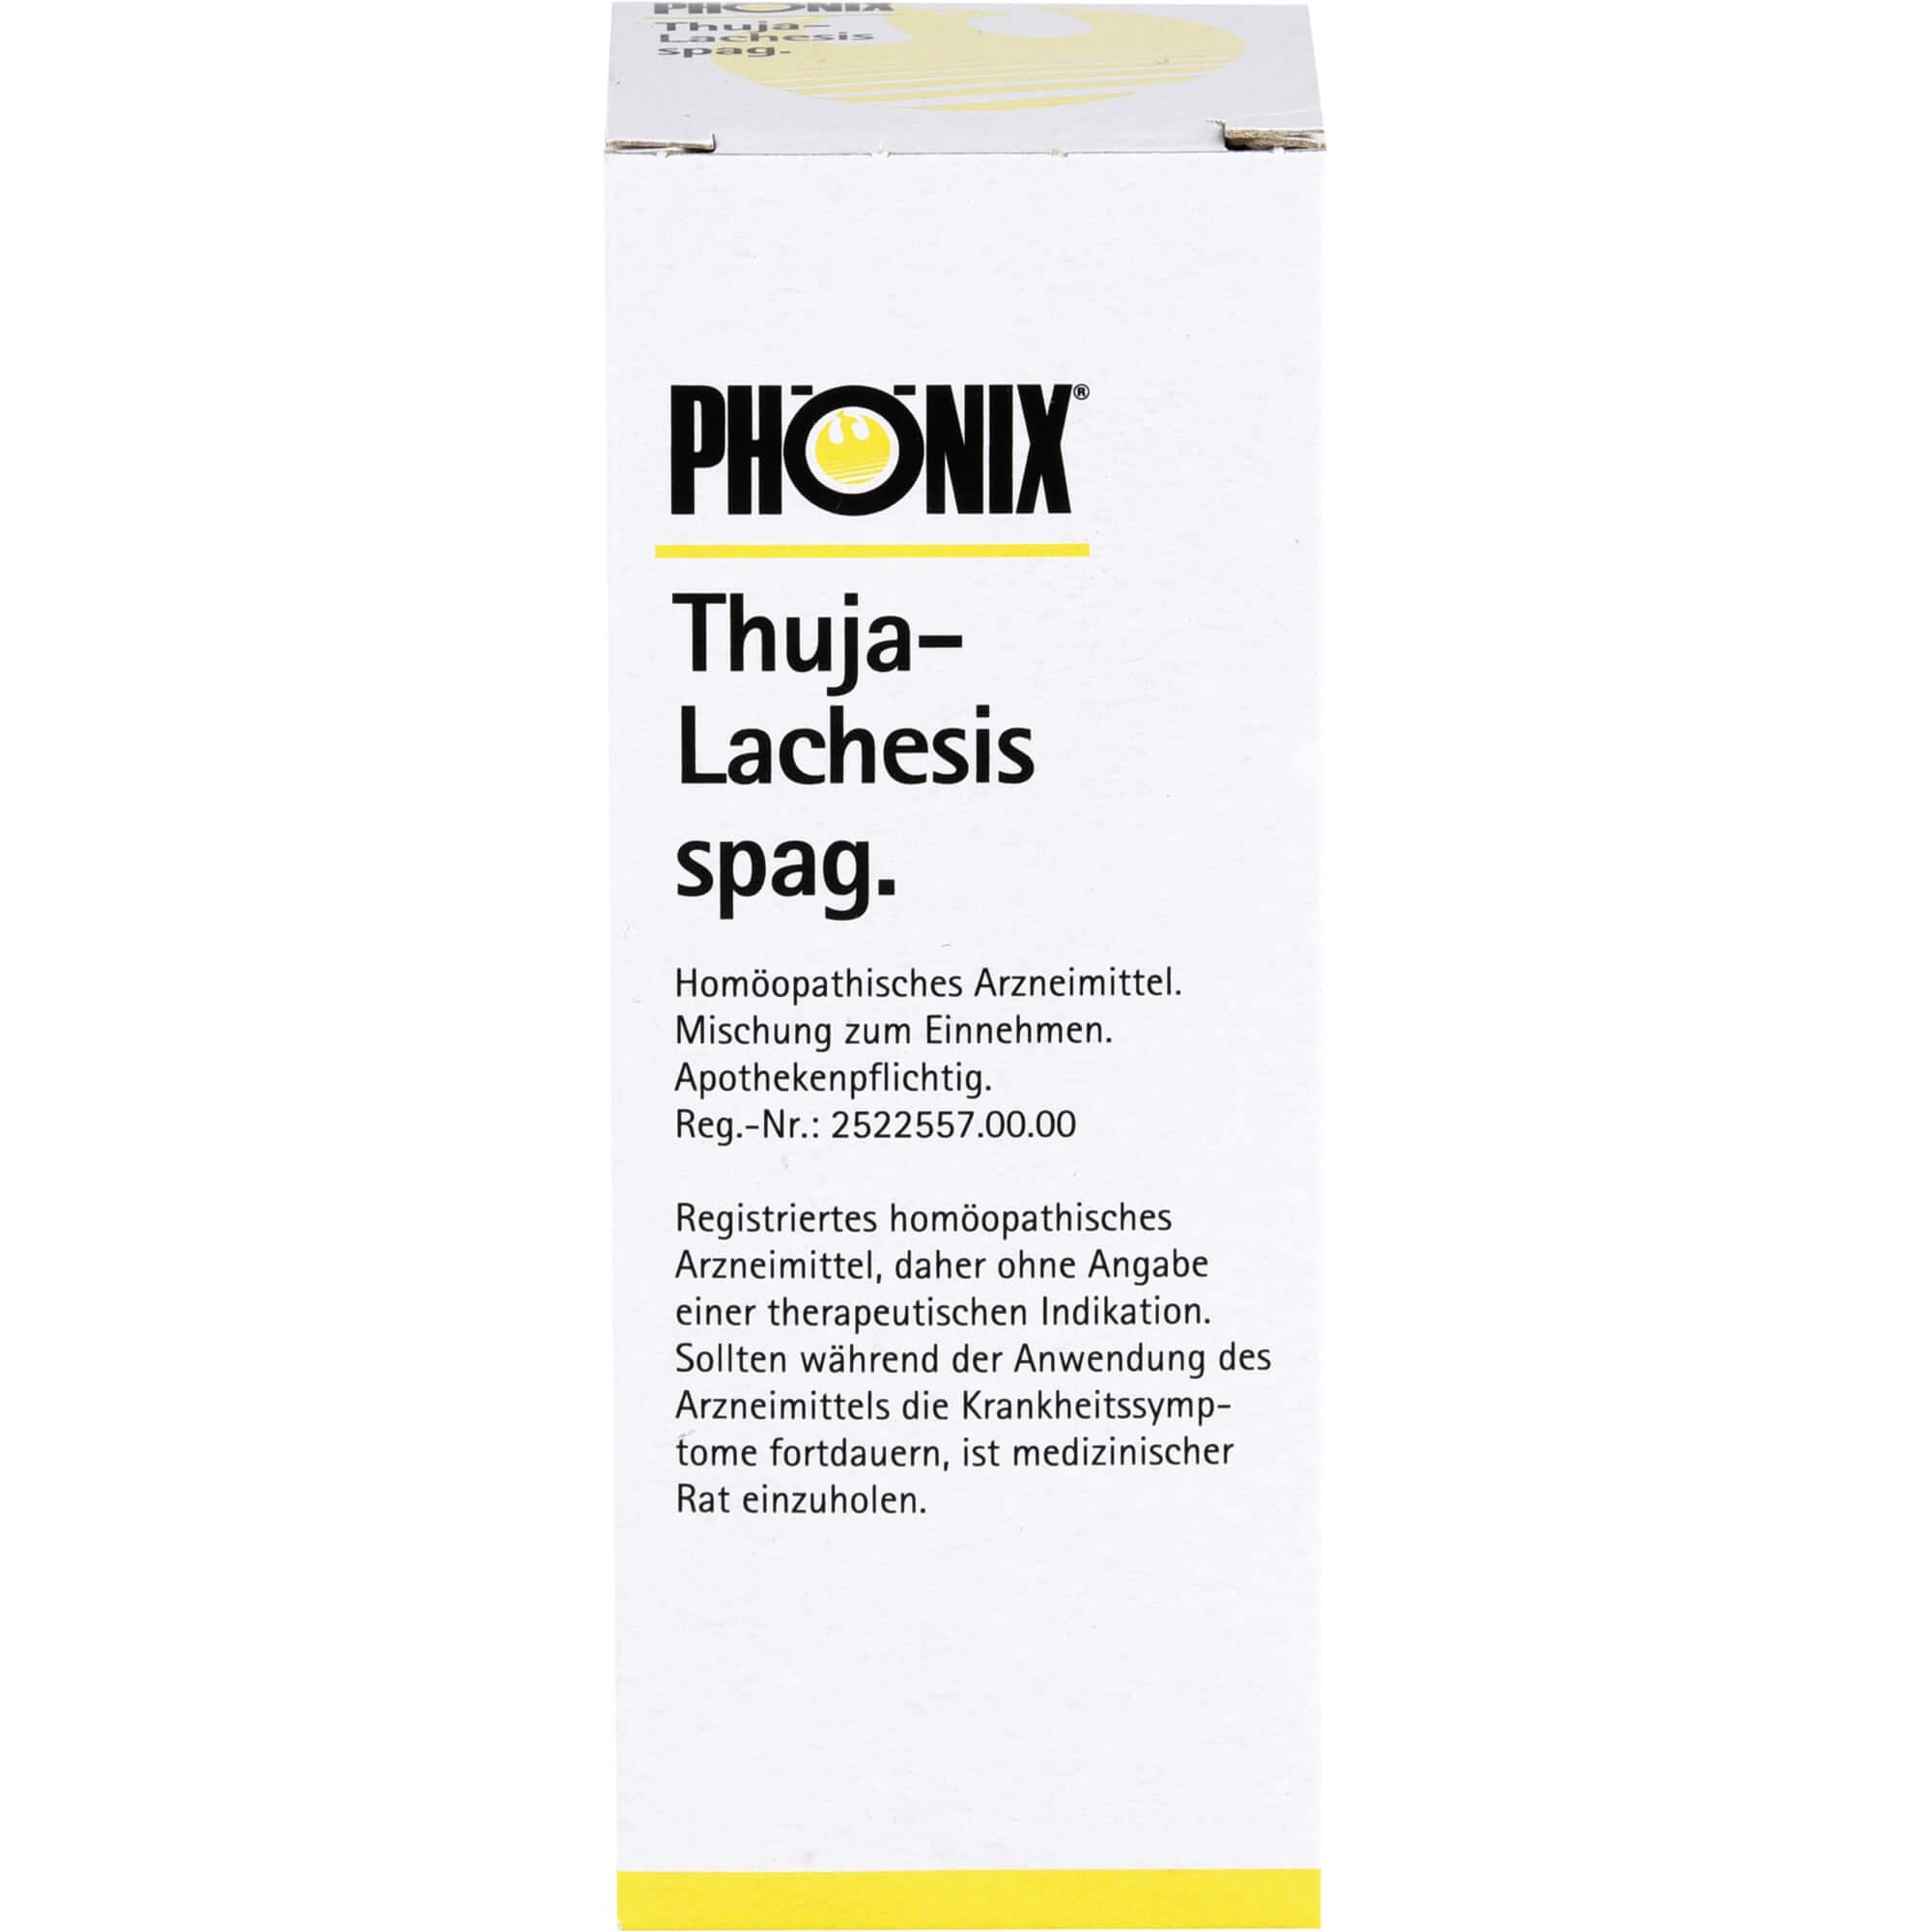 PHOeNIX-THUJA-lachesis-spag-Mischung